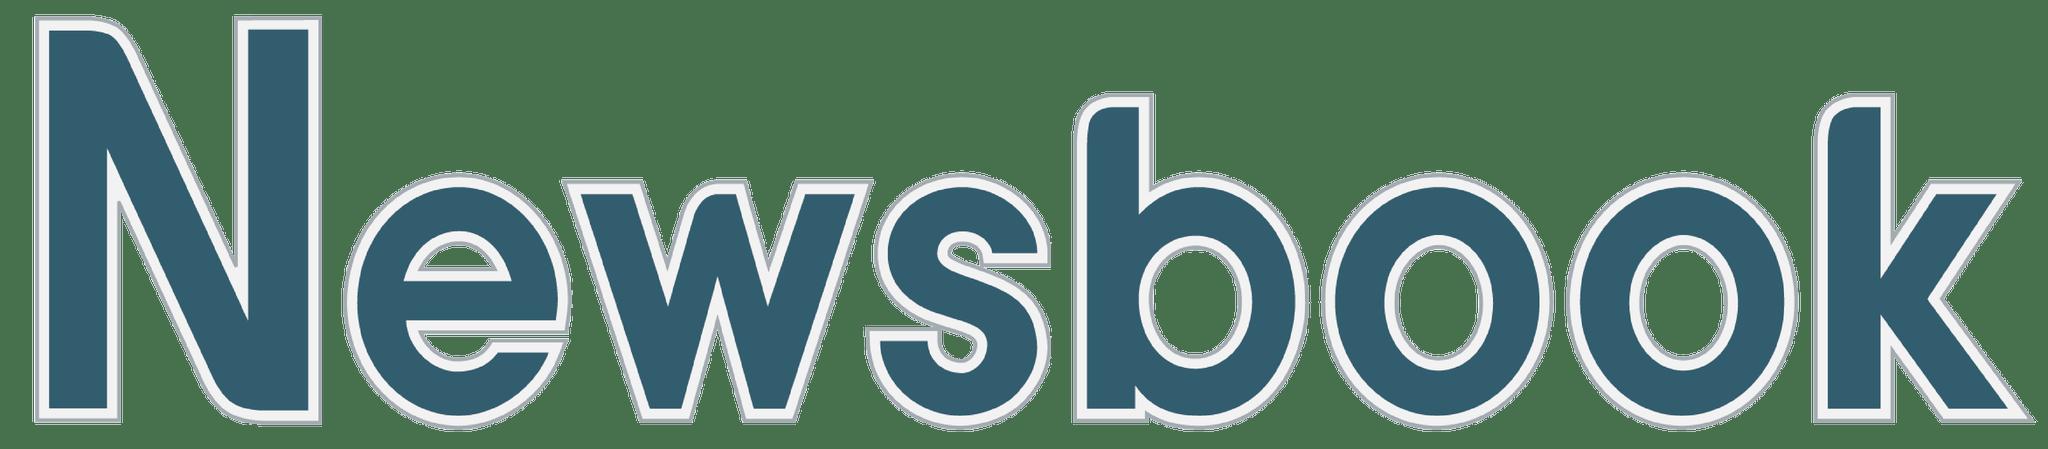 Newsbook